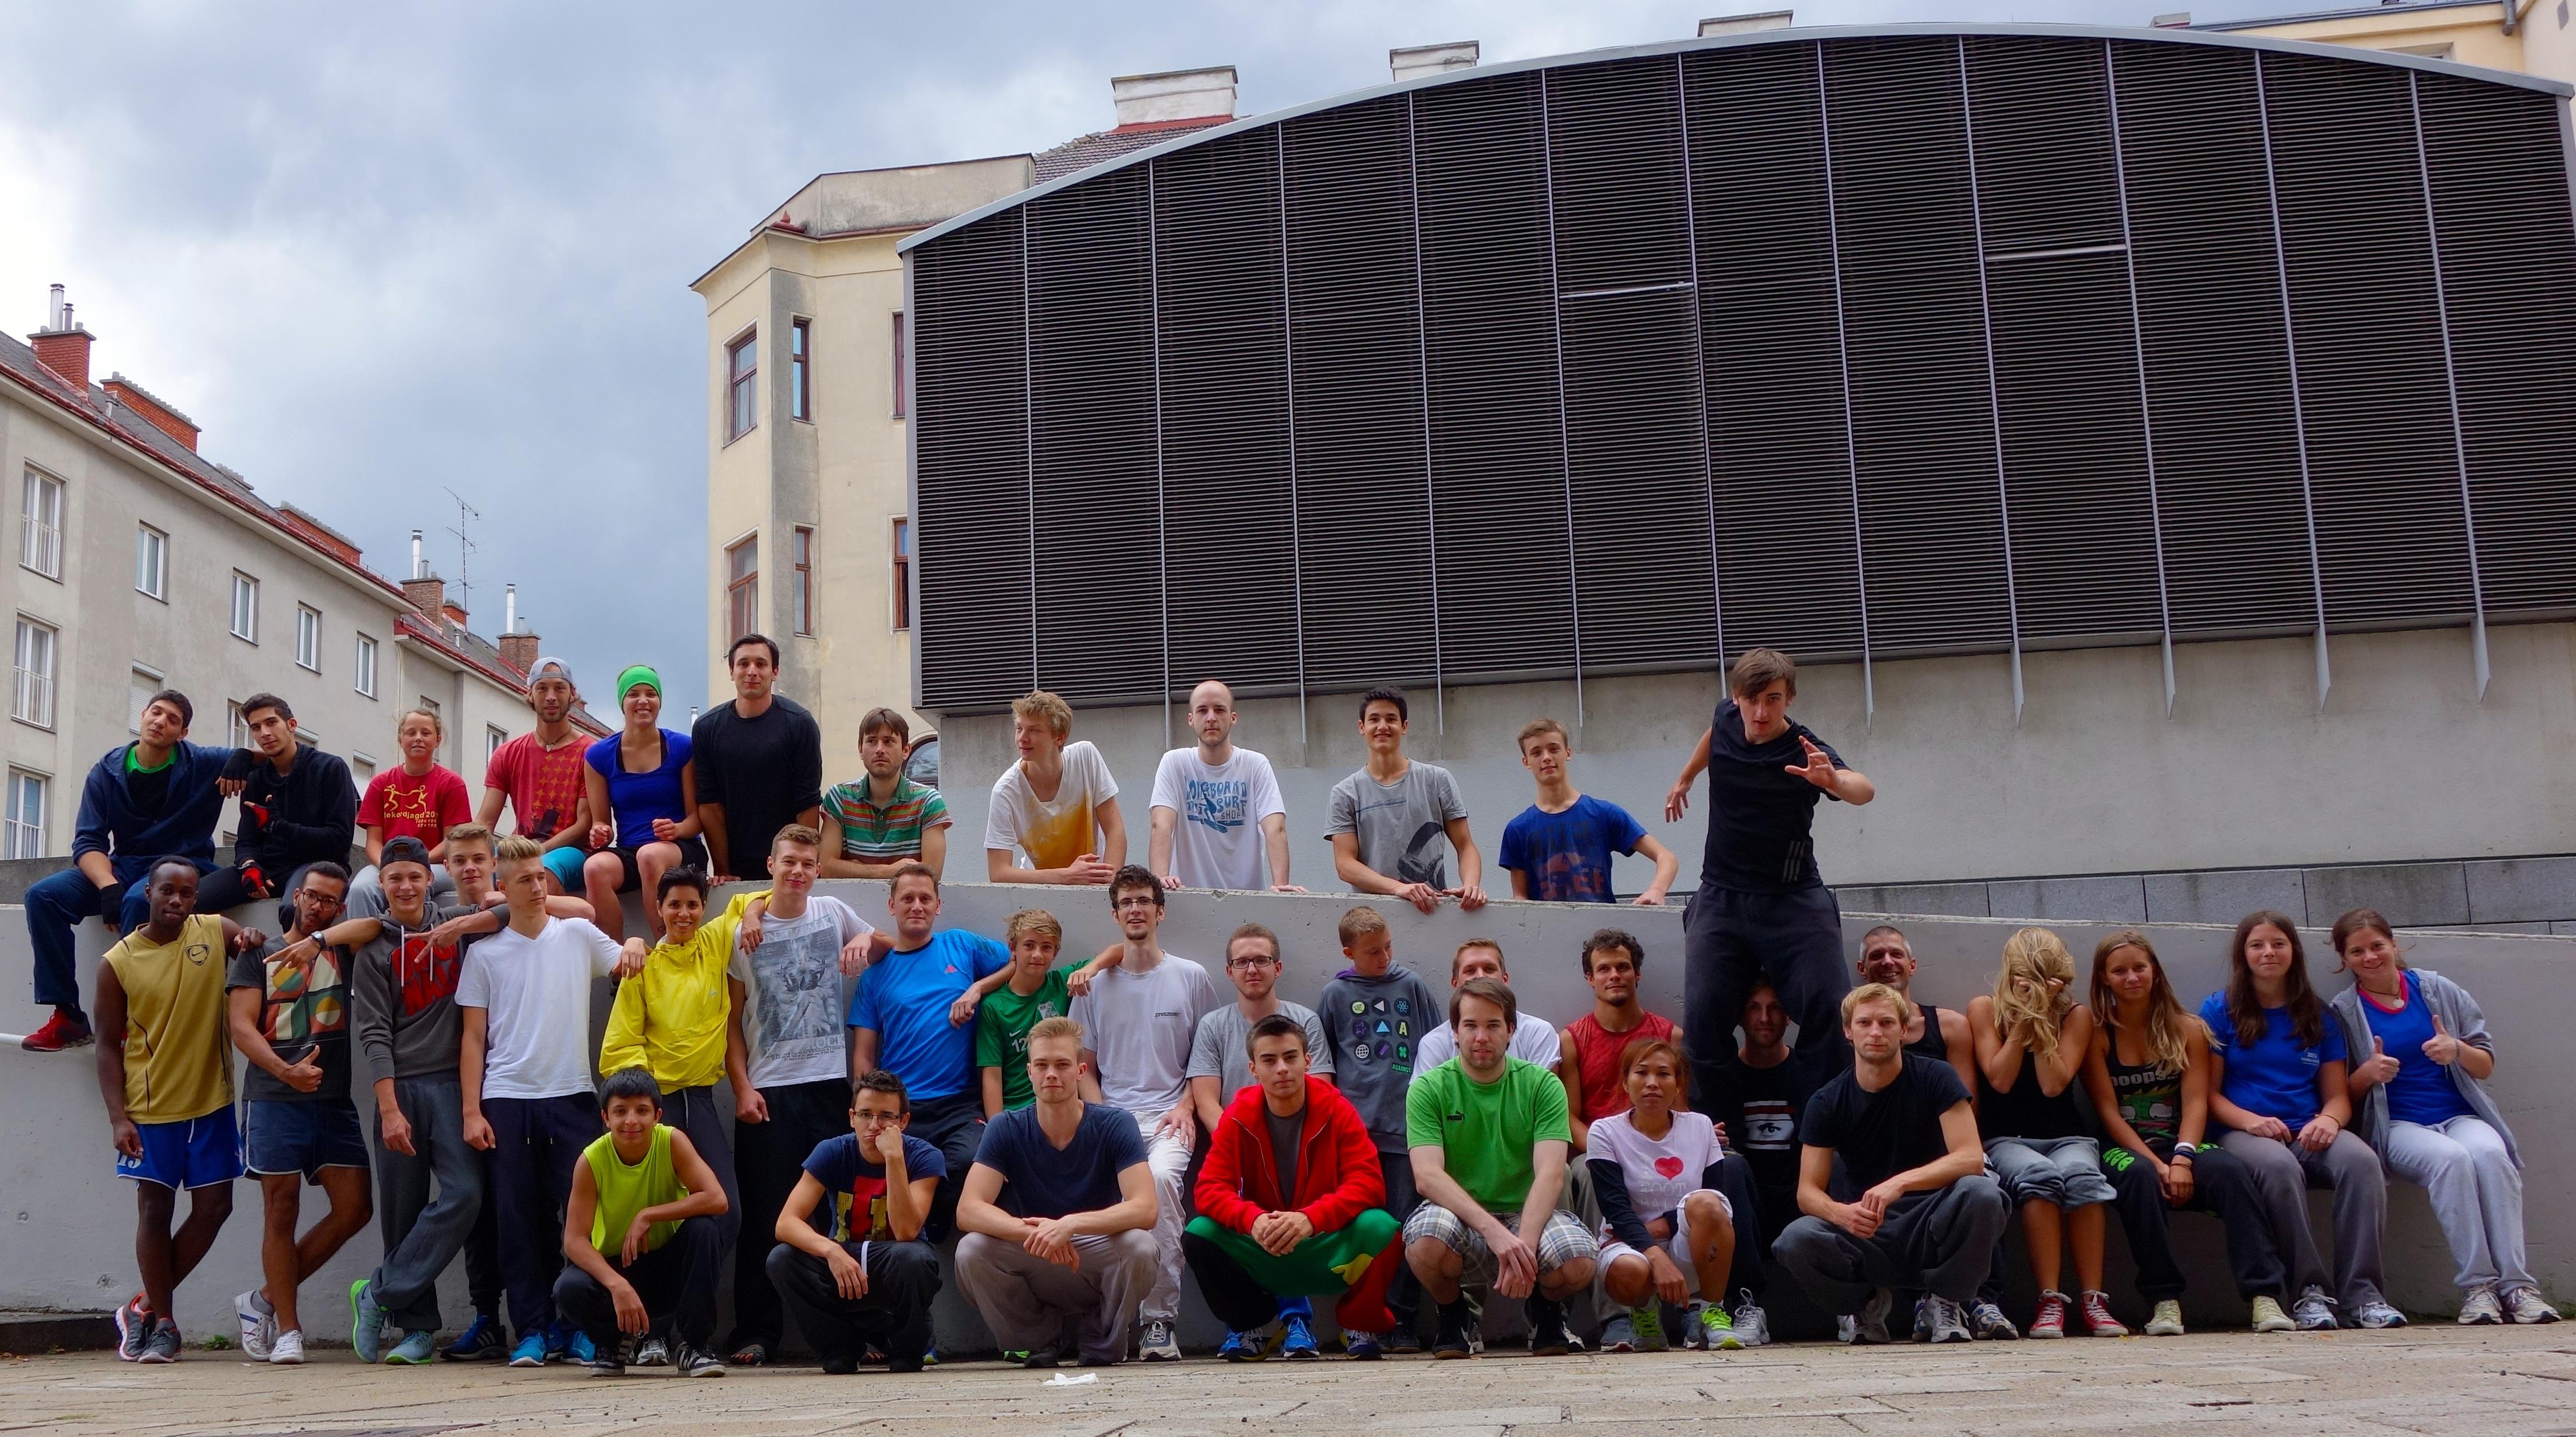 Forum-Meeting 24.08.2014